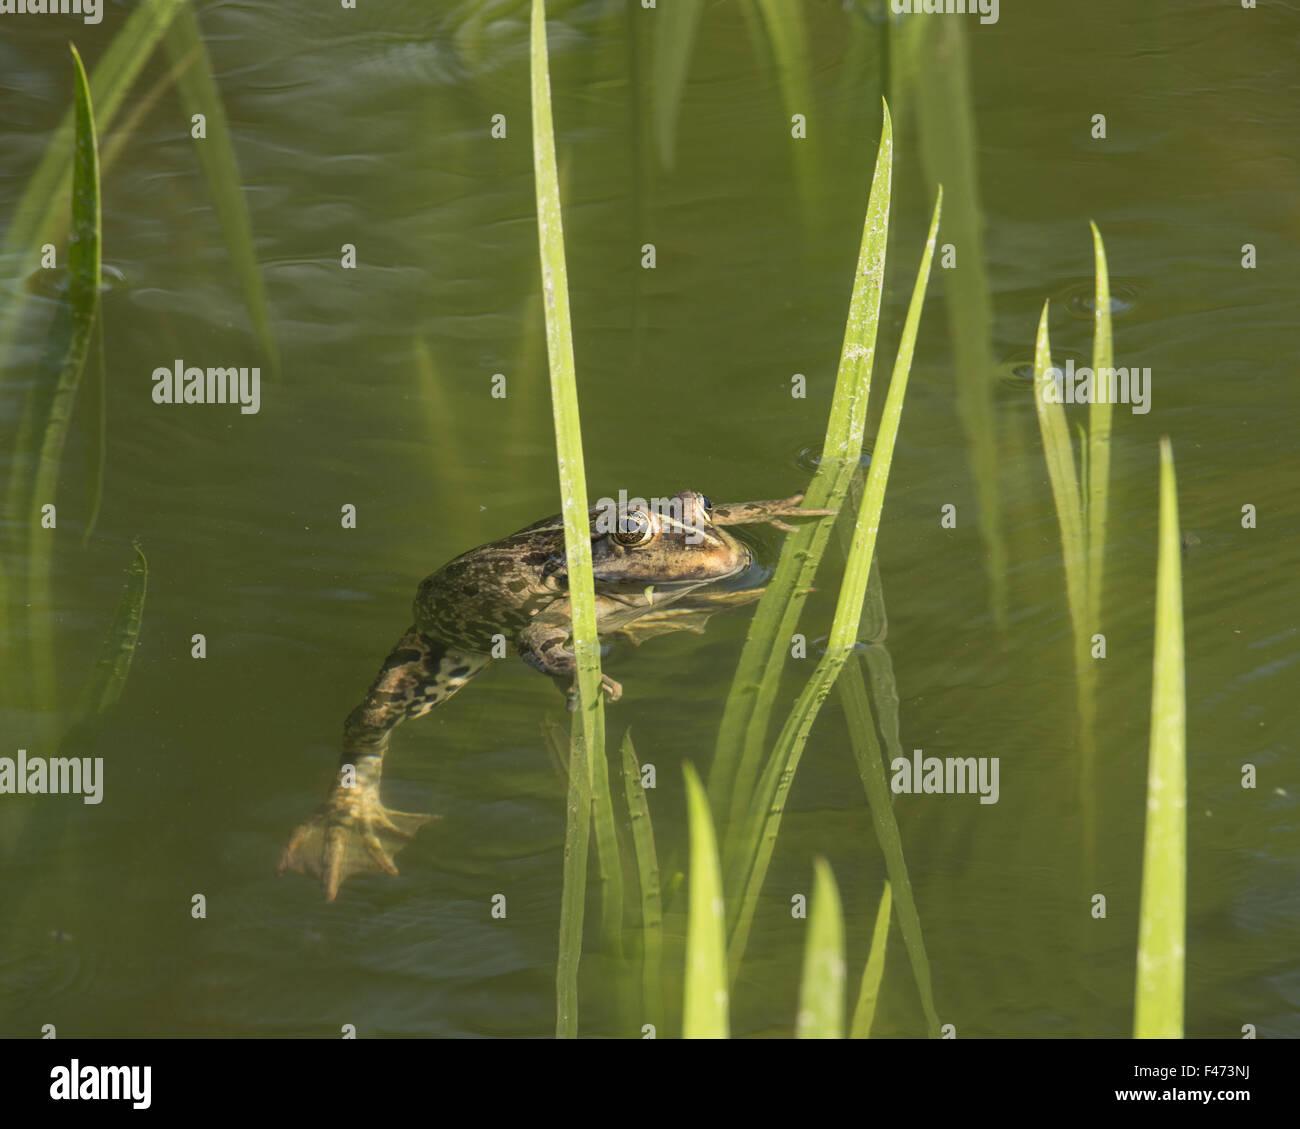 Edible frog, also common water frog or green frog (Rana esculenta) swimming between stalks, North Rhine-Westphalia, - Stock Image